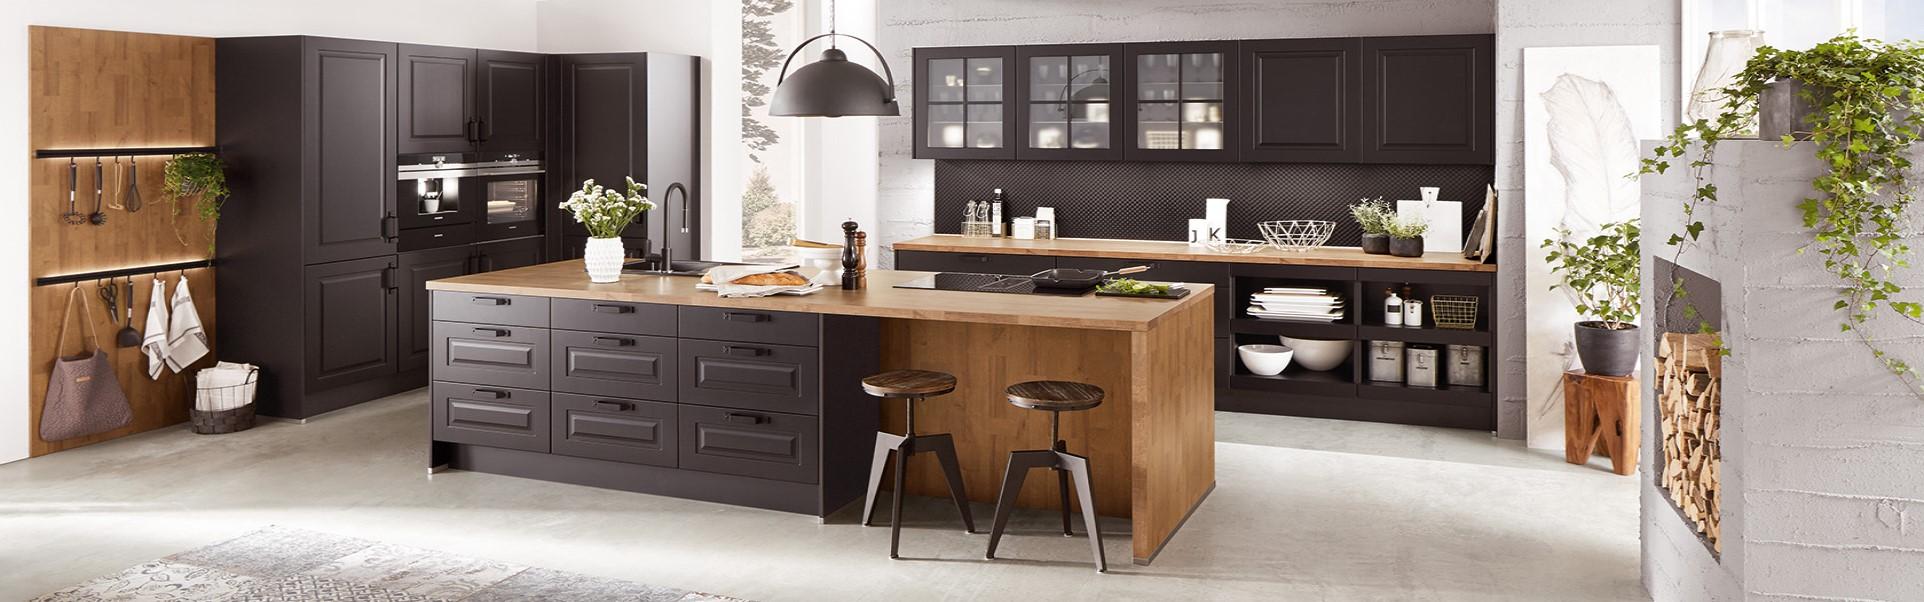 Kuchyně Highline